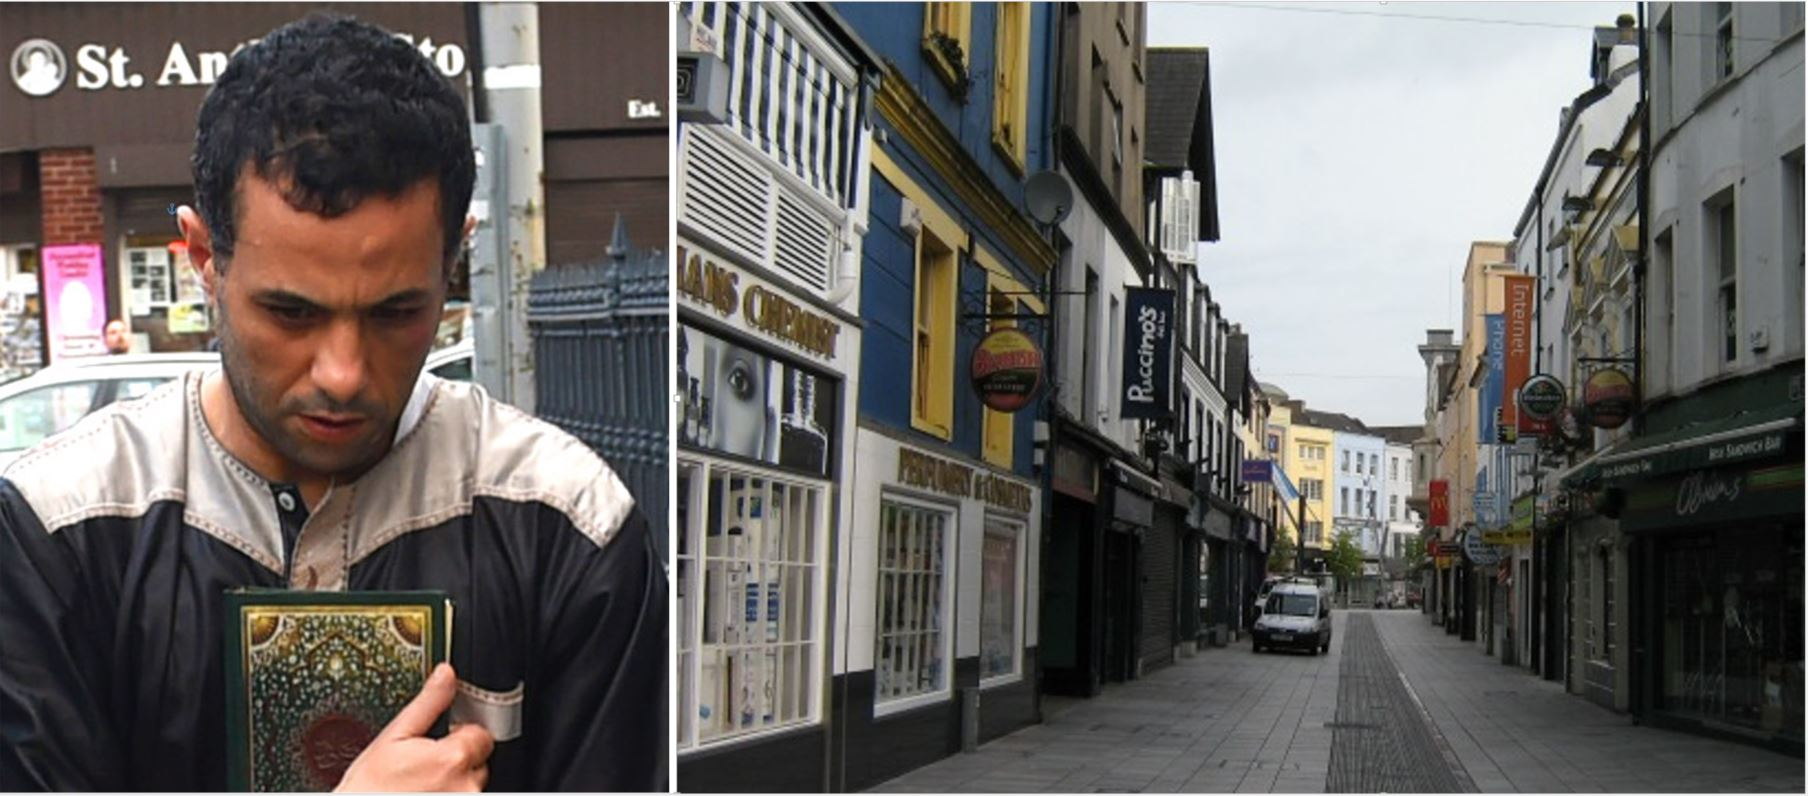 Ireland: Man in Cork city threatened to behead Jews, court hears